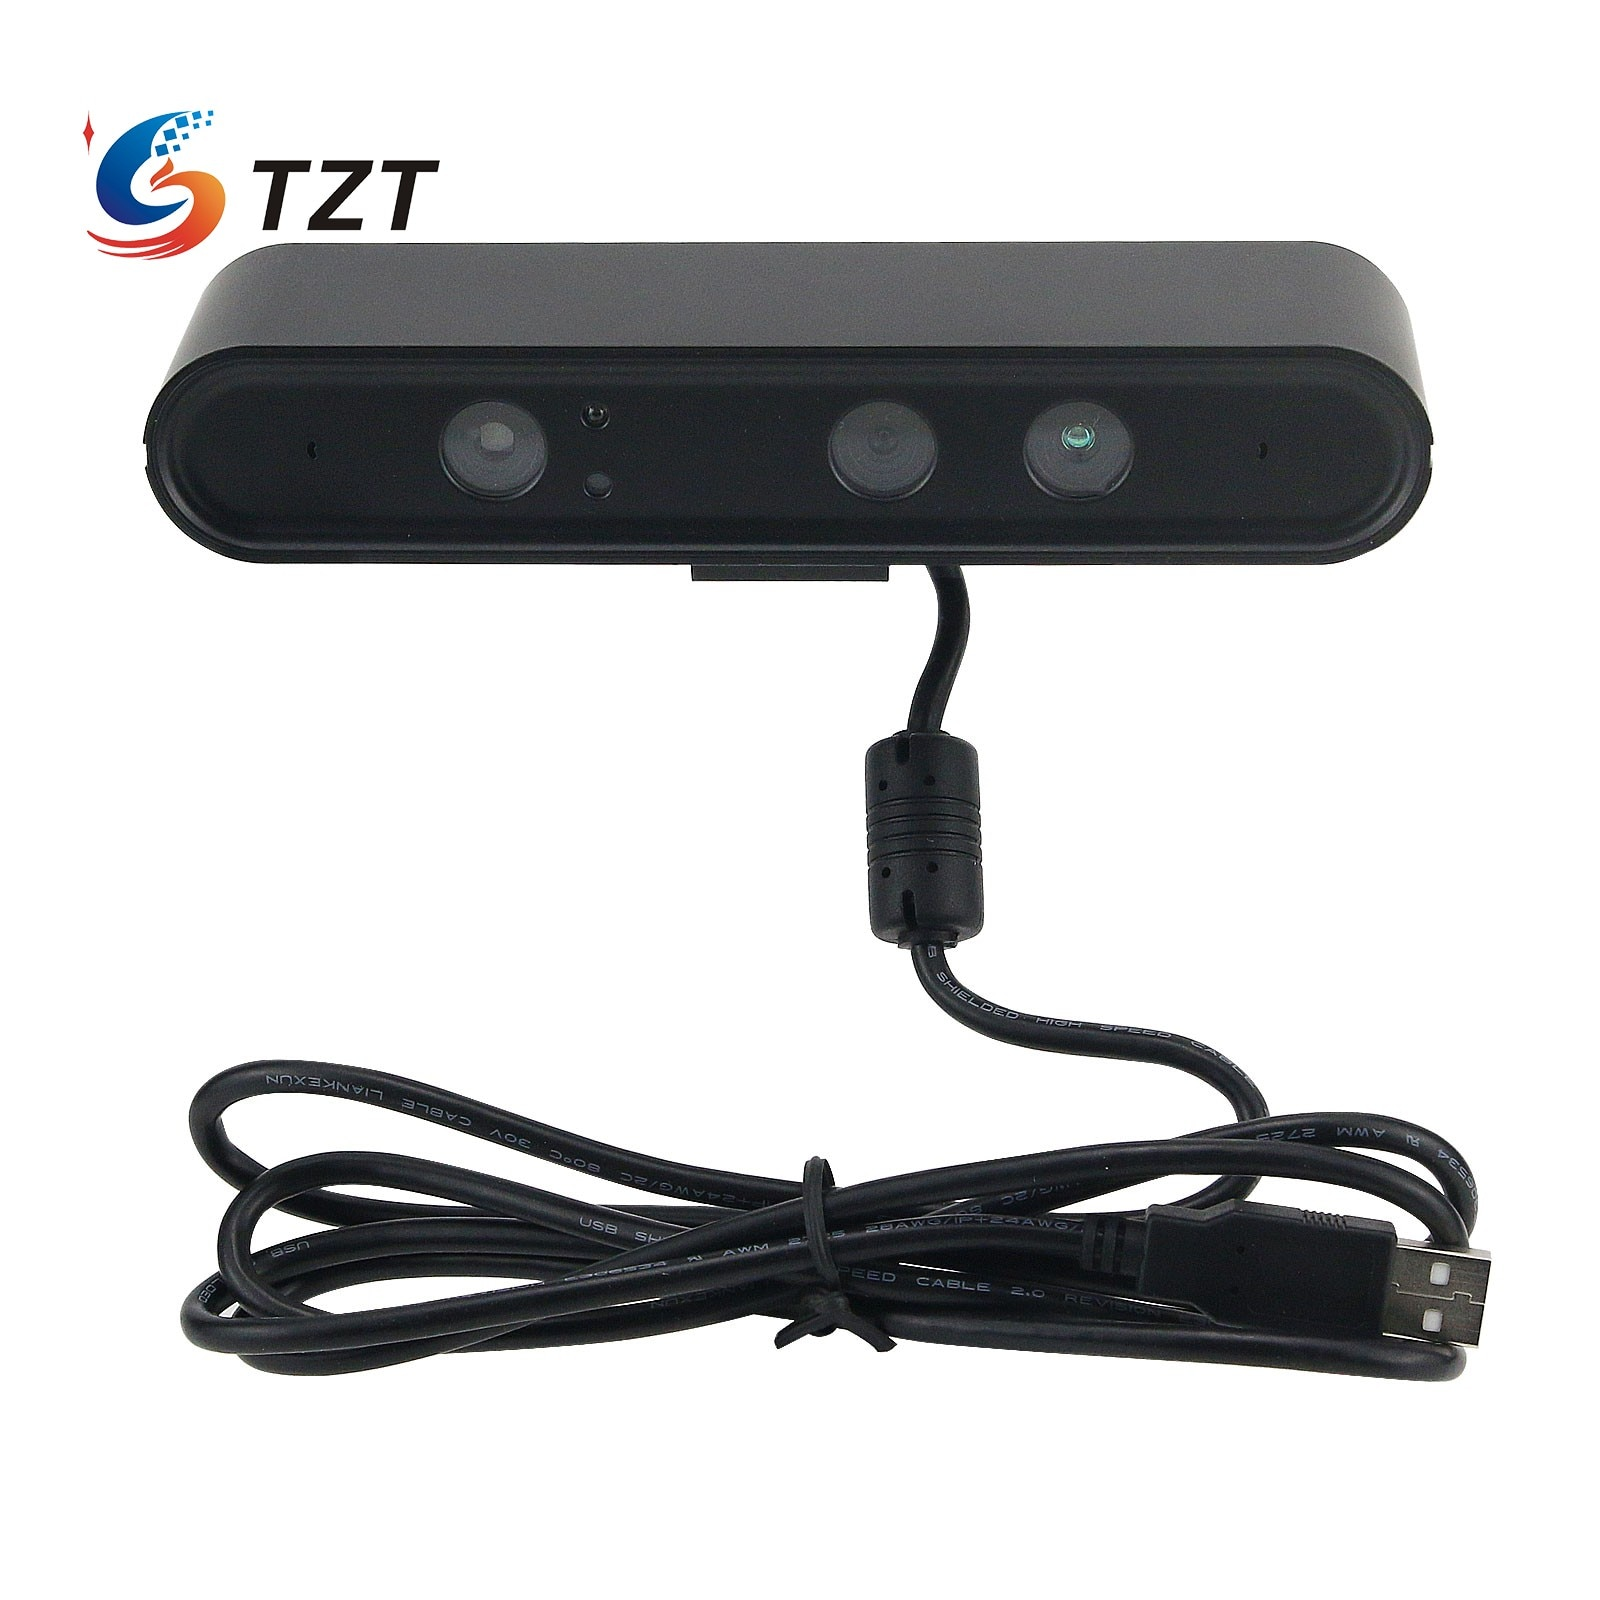 TZT أوربيك أسترا s كاميرا الحسية الجسدية دعم ثلاثية الأبعاد المسح الضوئي التعرف على الوجه للعب الألعاب استبدال LeTMC-520